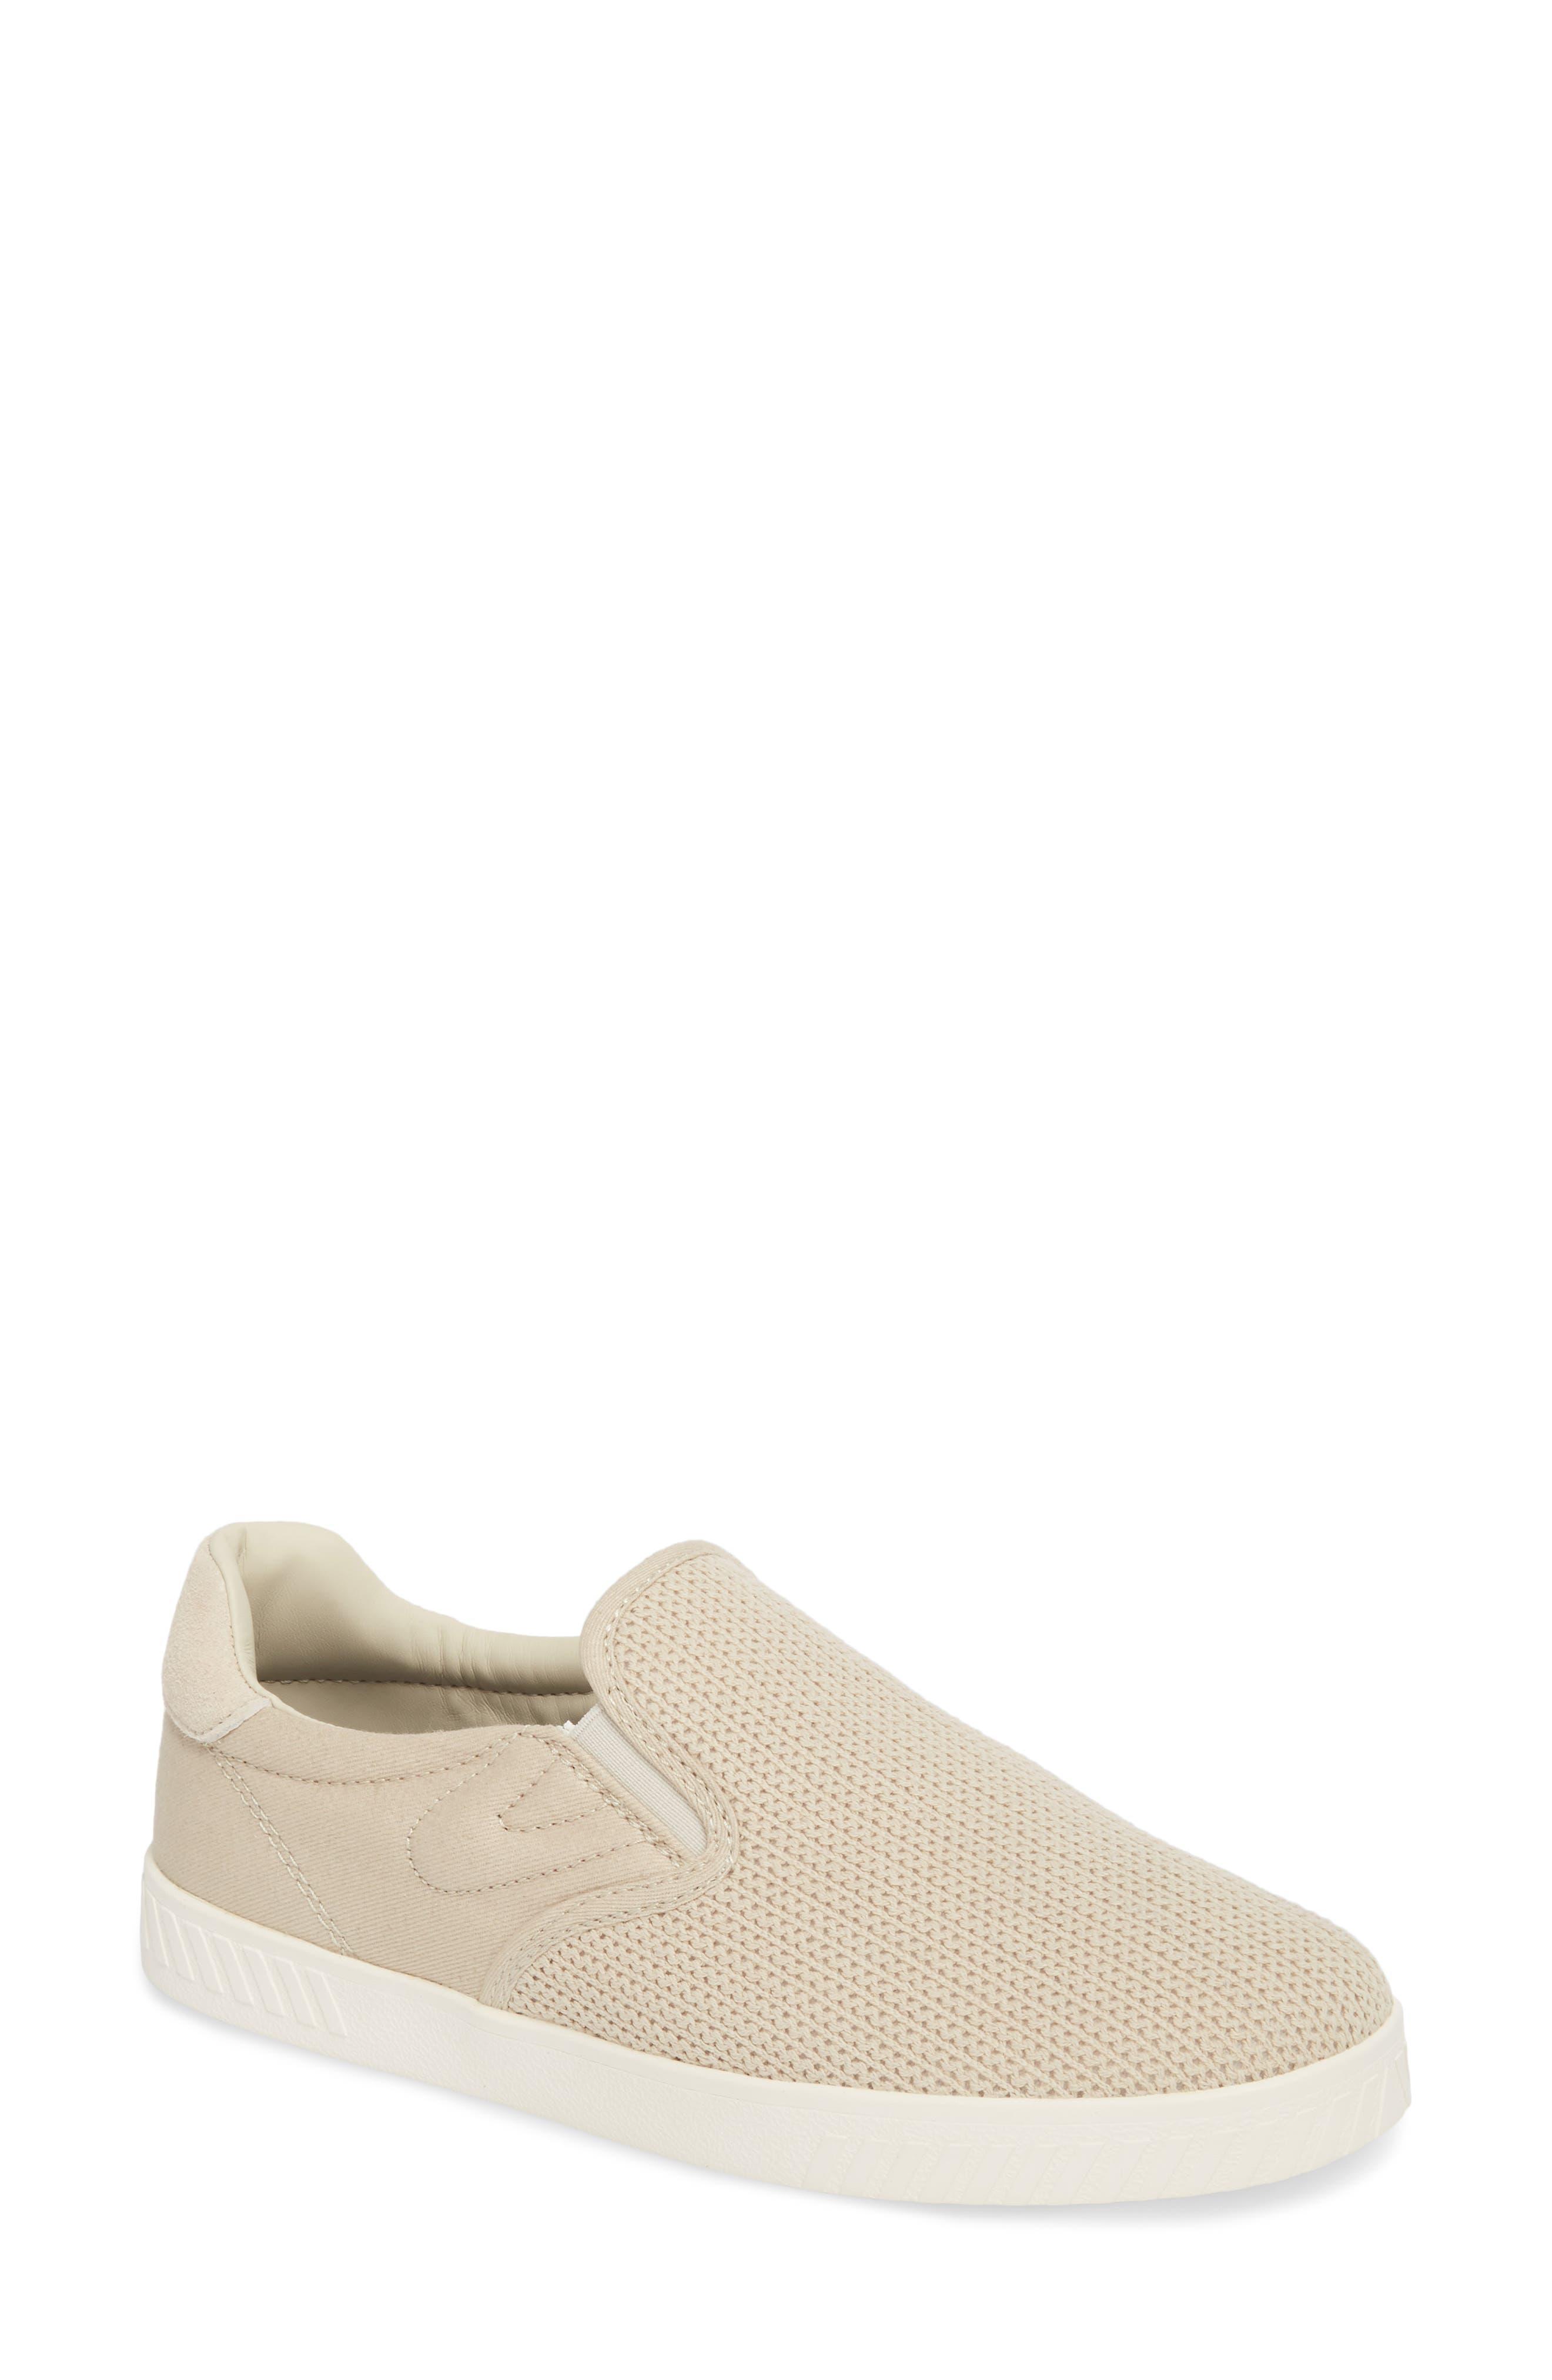 Cruz Mesh Slip-On Sneaker,                         Main,                         color, Sand